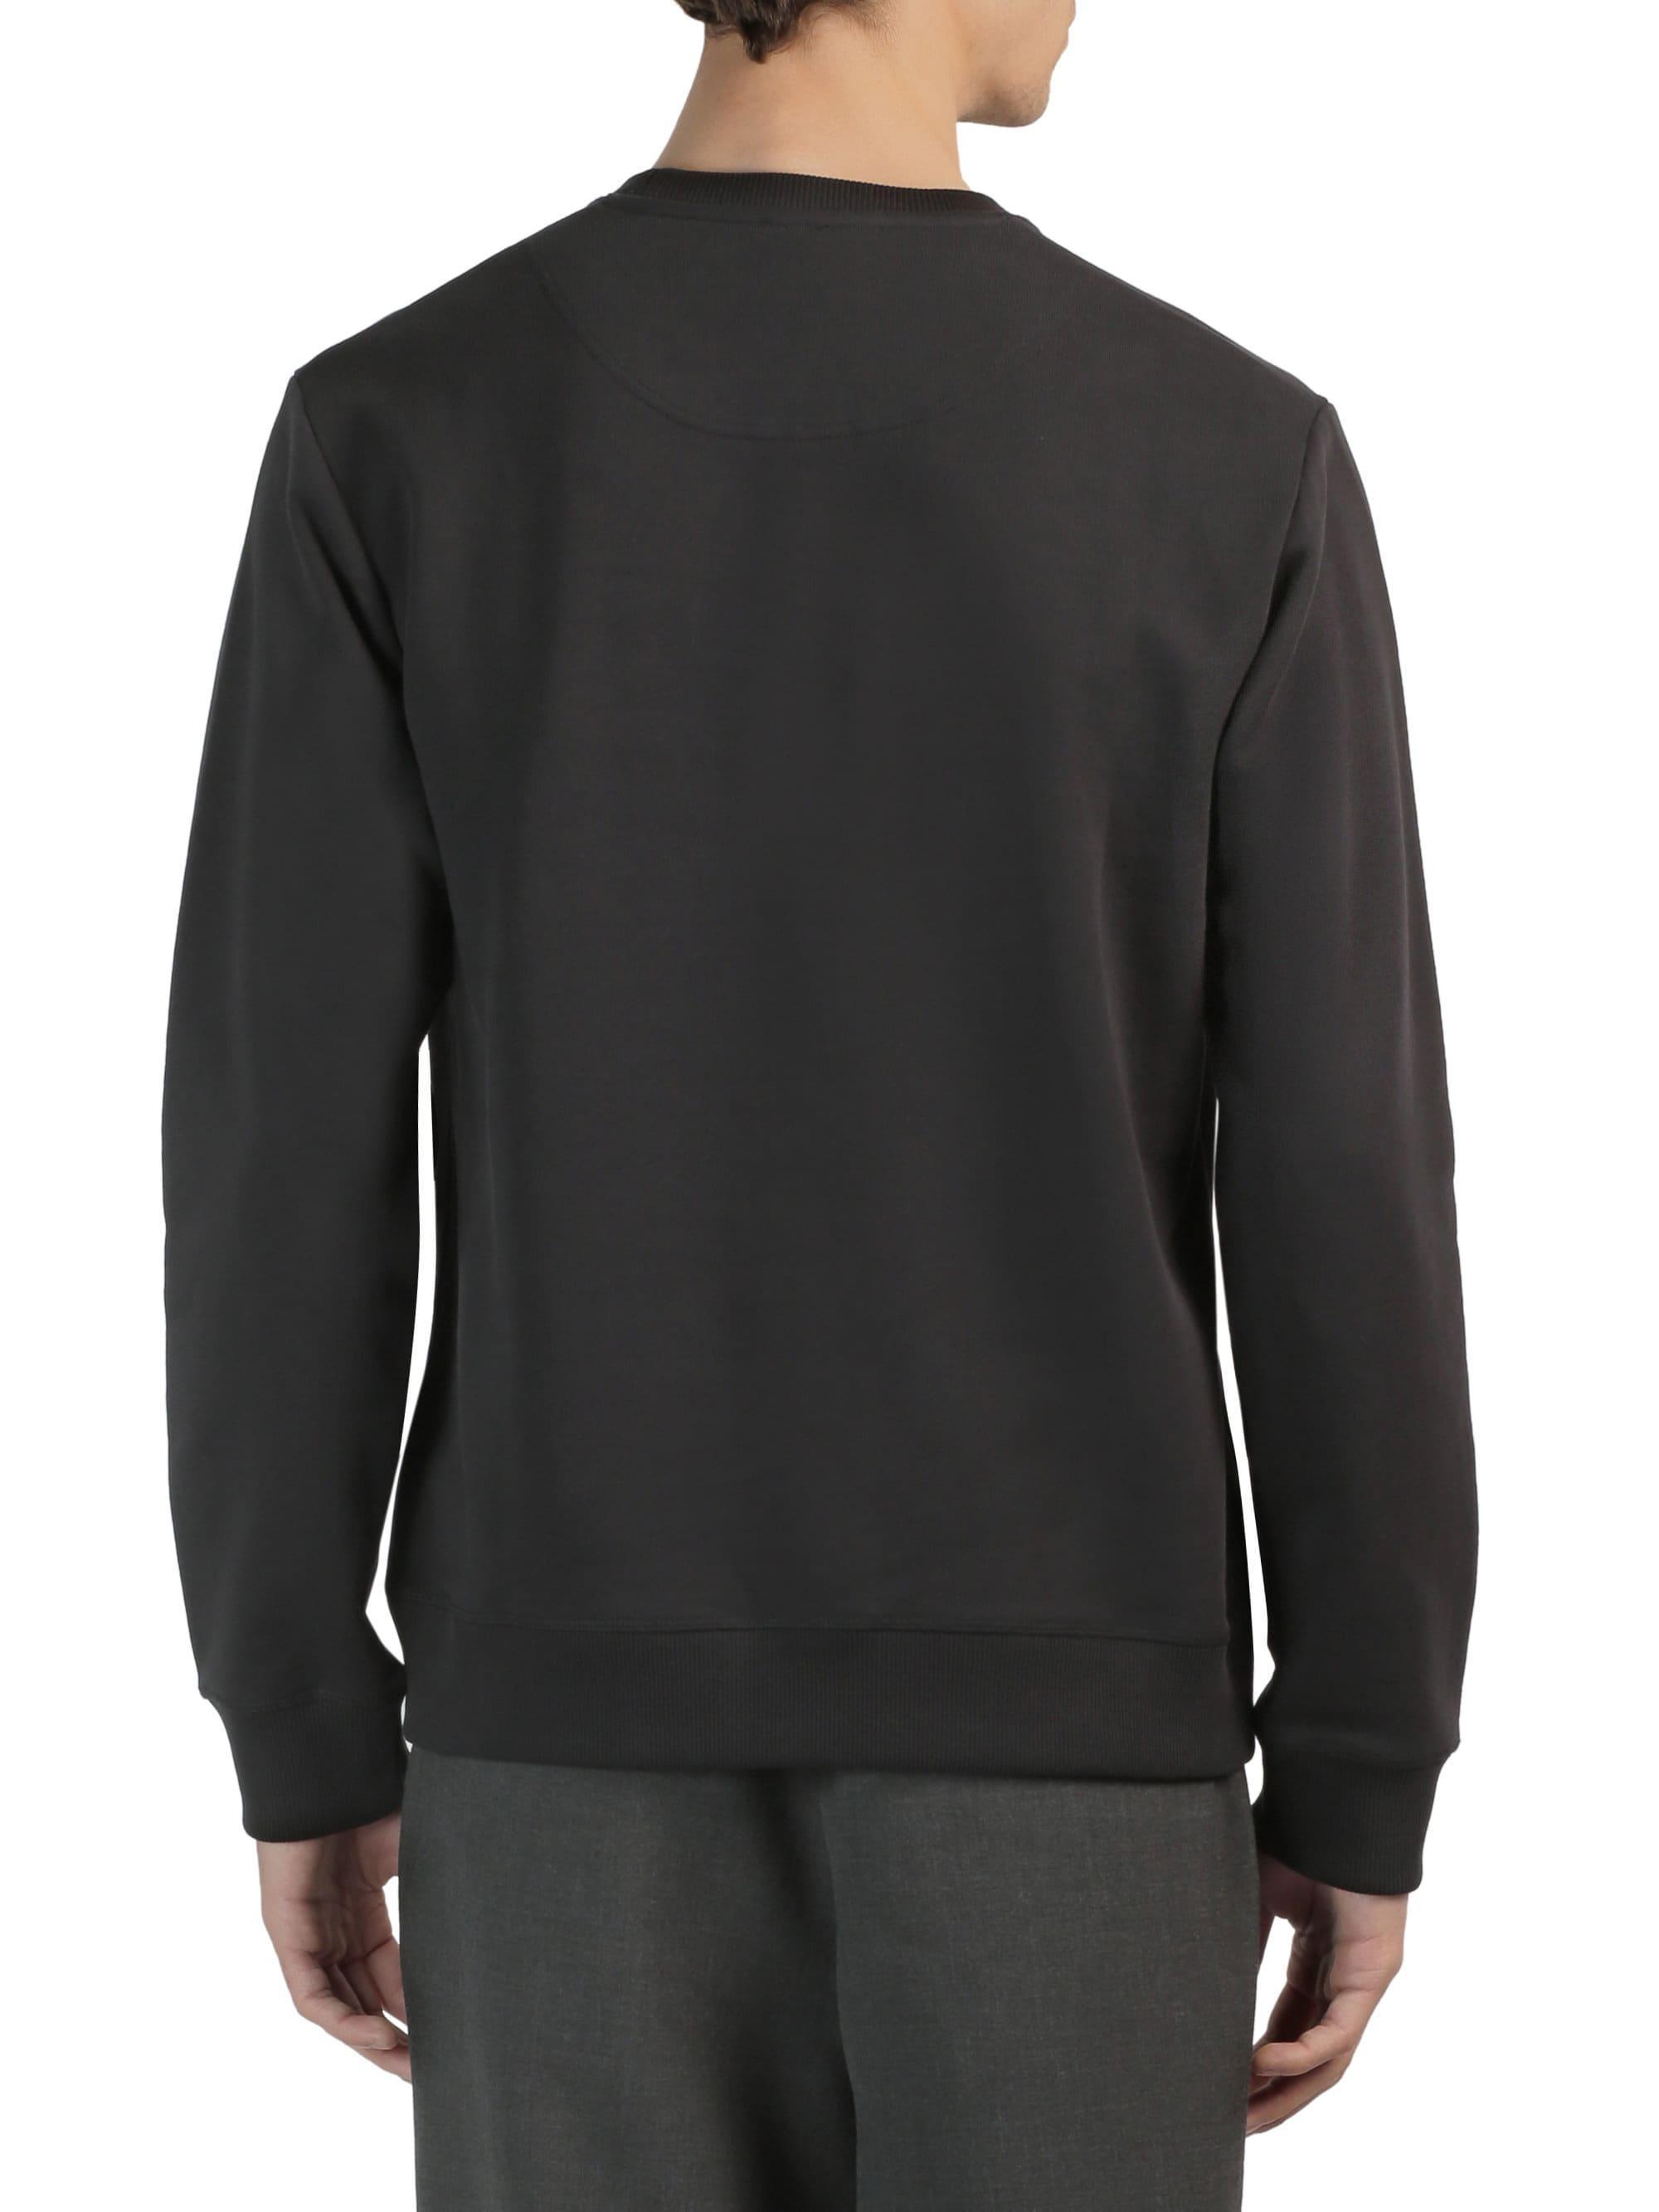 900cf0048 KENZO Men's Dragon Tiger Sweatshirt - Black in Black for Men - Lyst